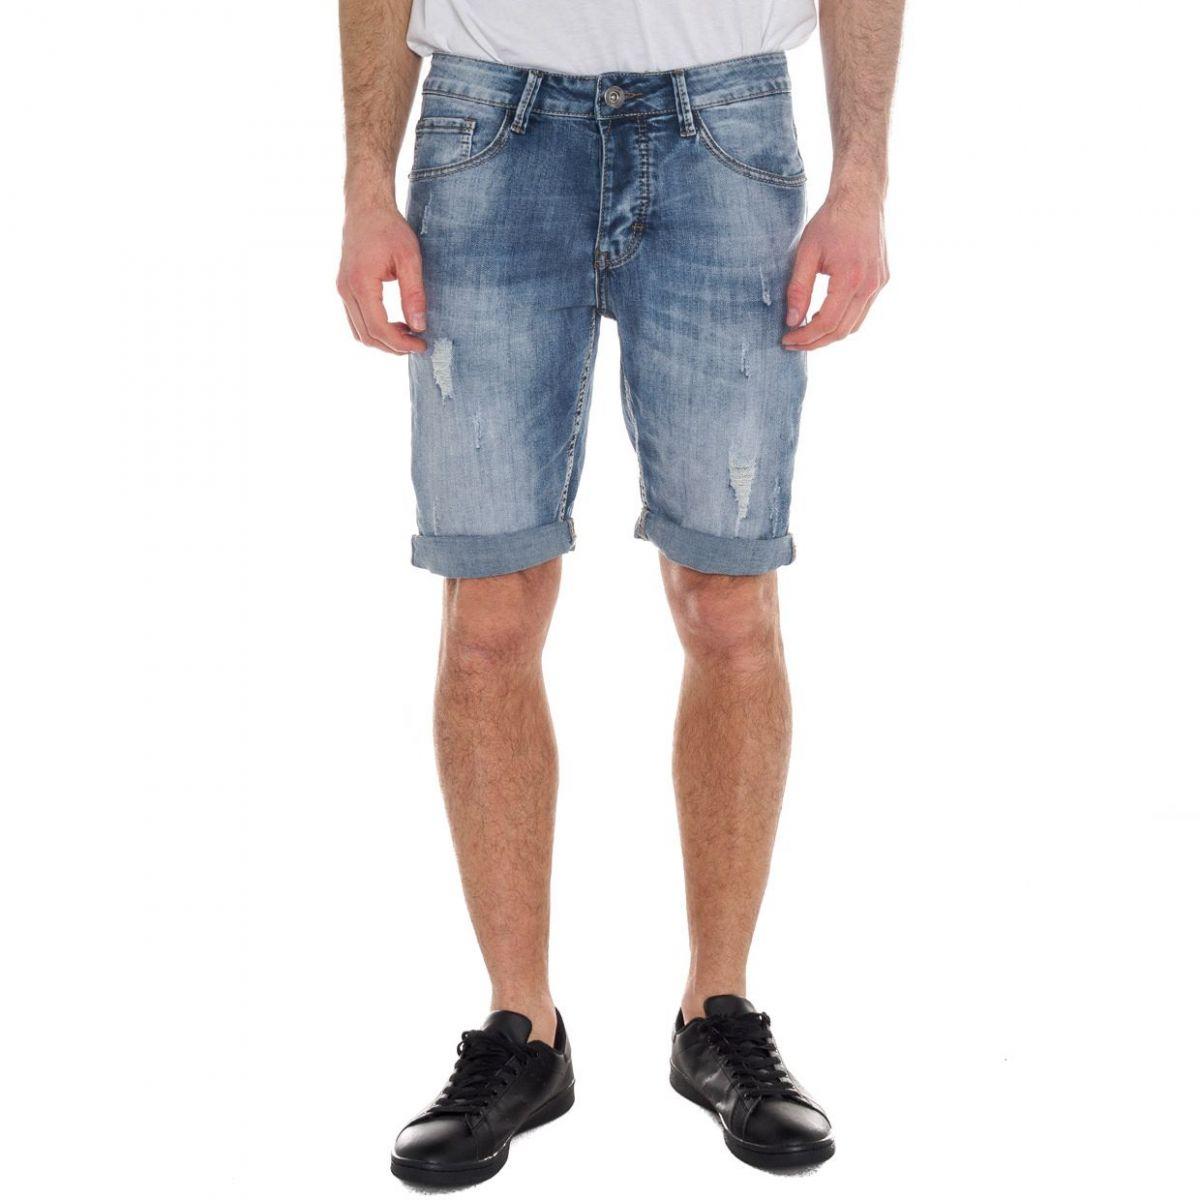 men's clothing sales Shorts LPHM1056 BLU Cafedelmar Shop